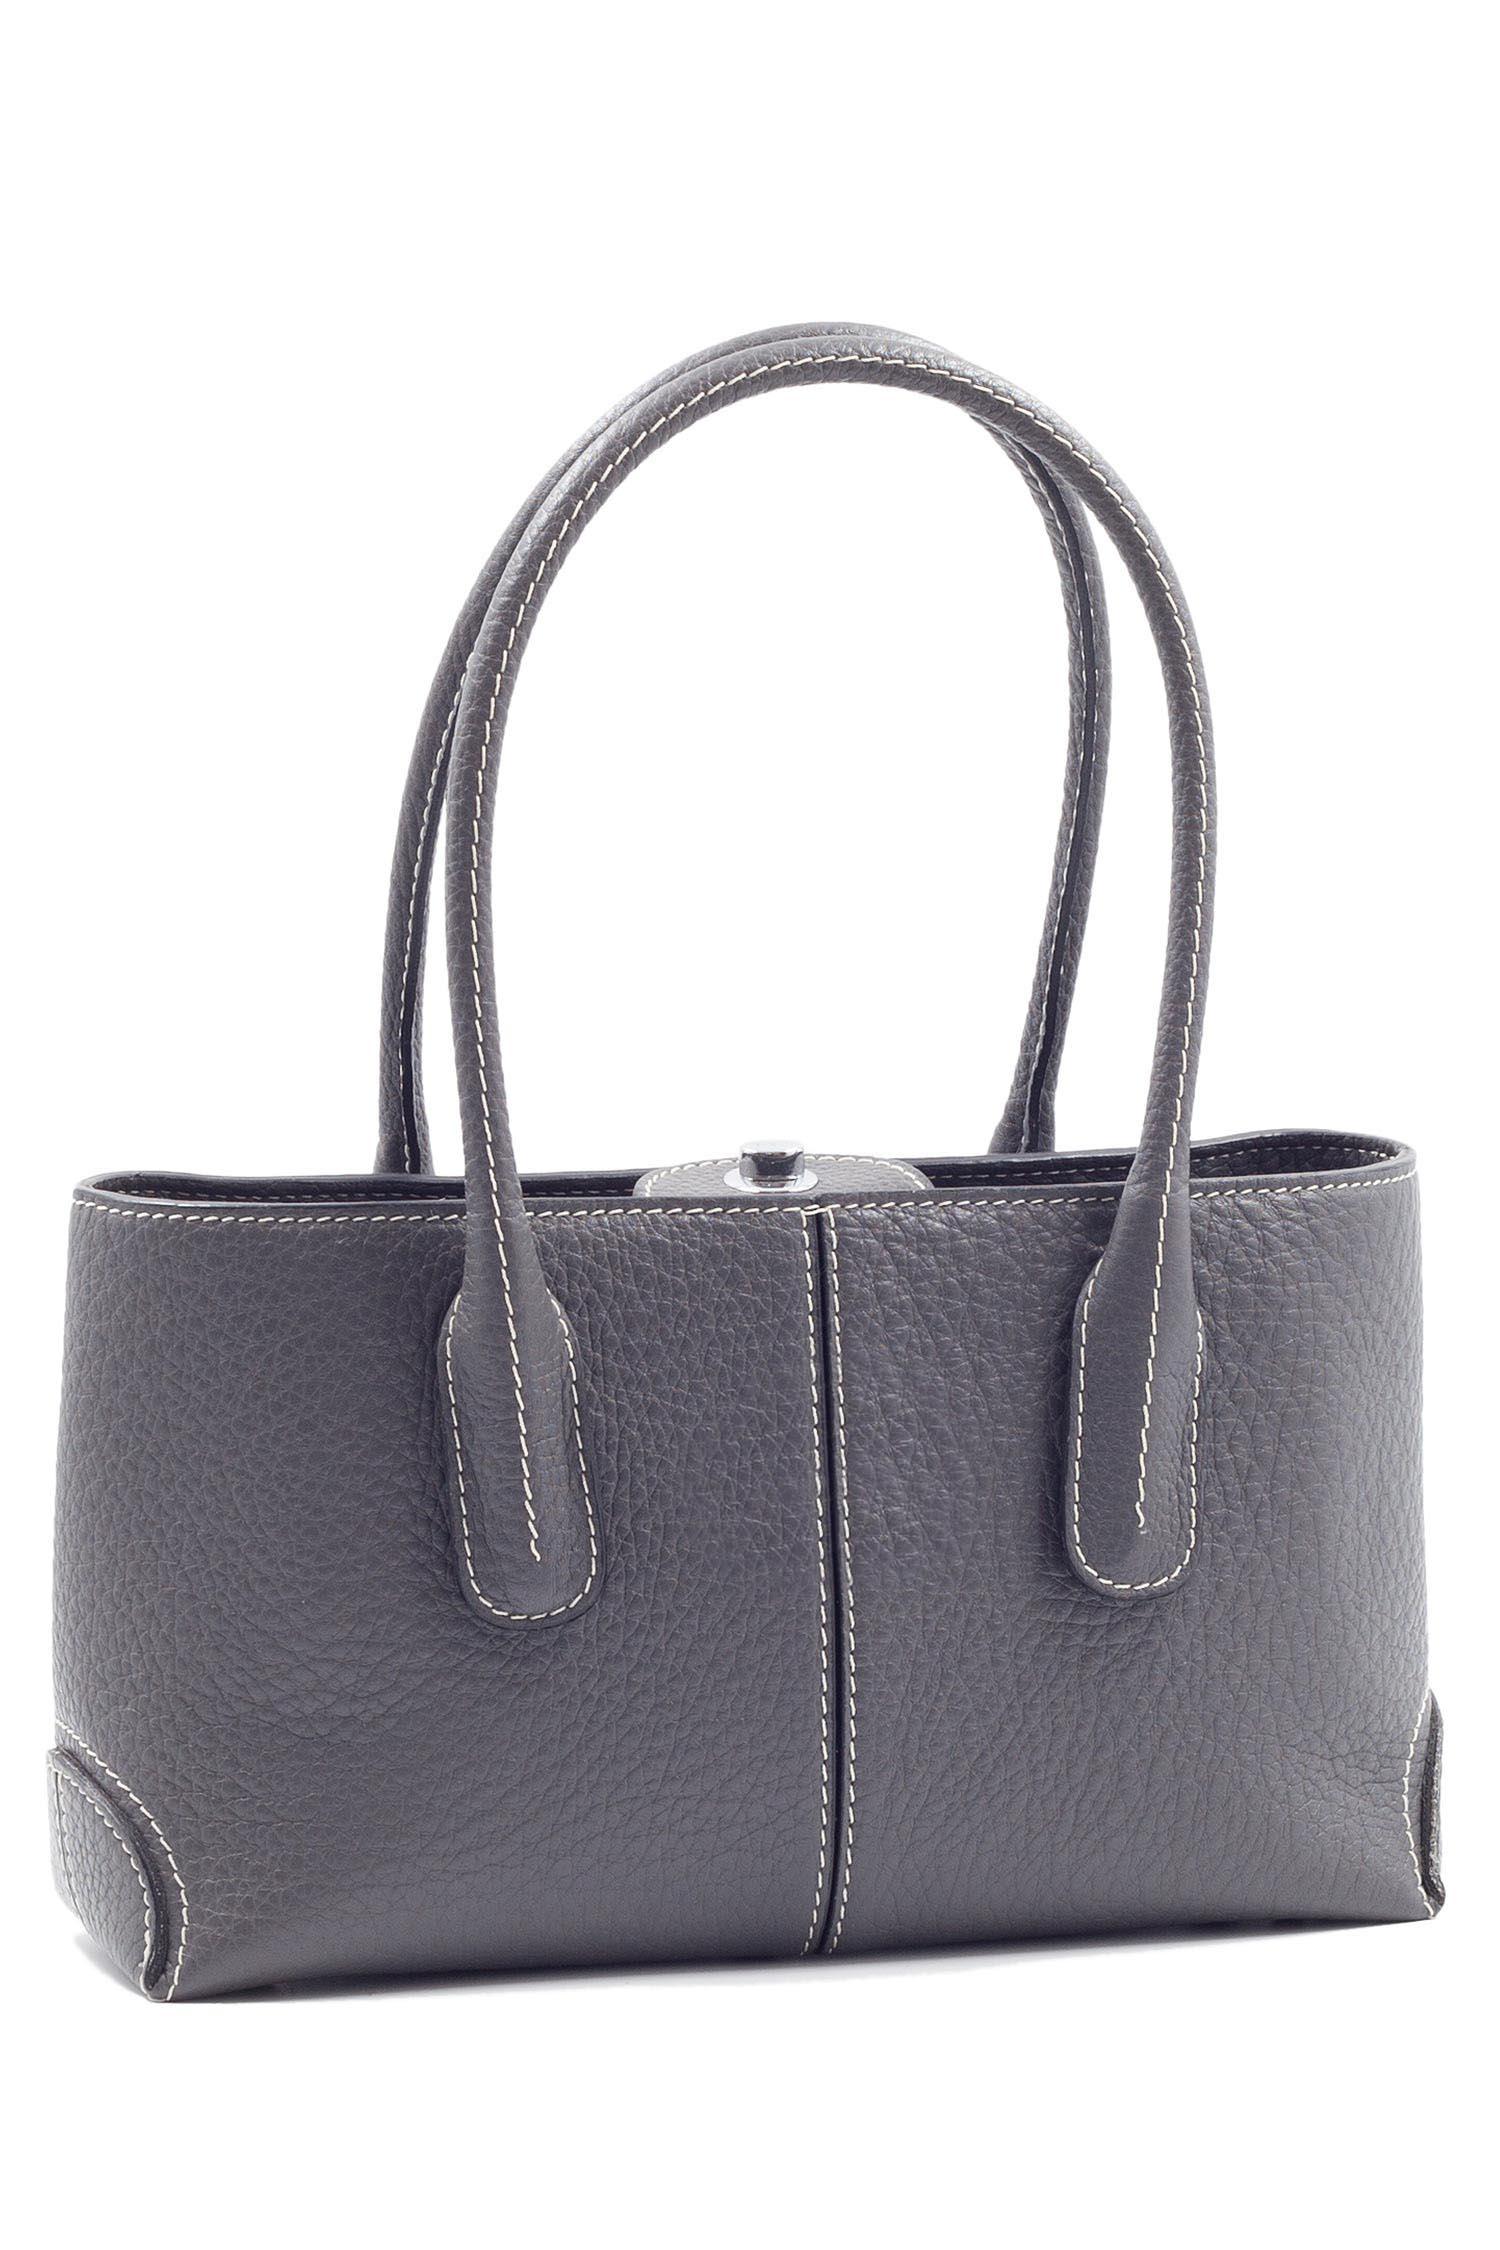 New Design 2017 Trend Luxury Unique Genuine Leather Woman Handbag